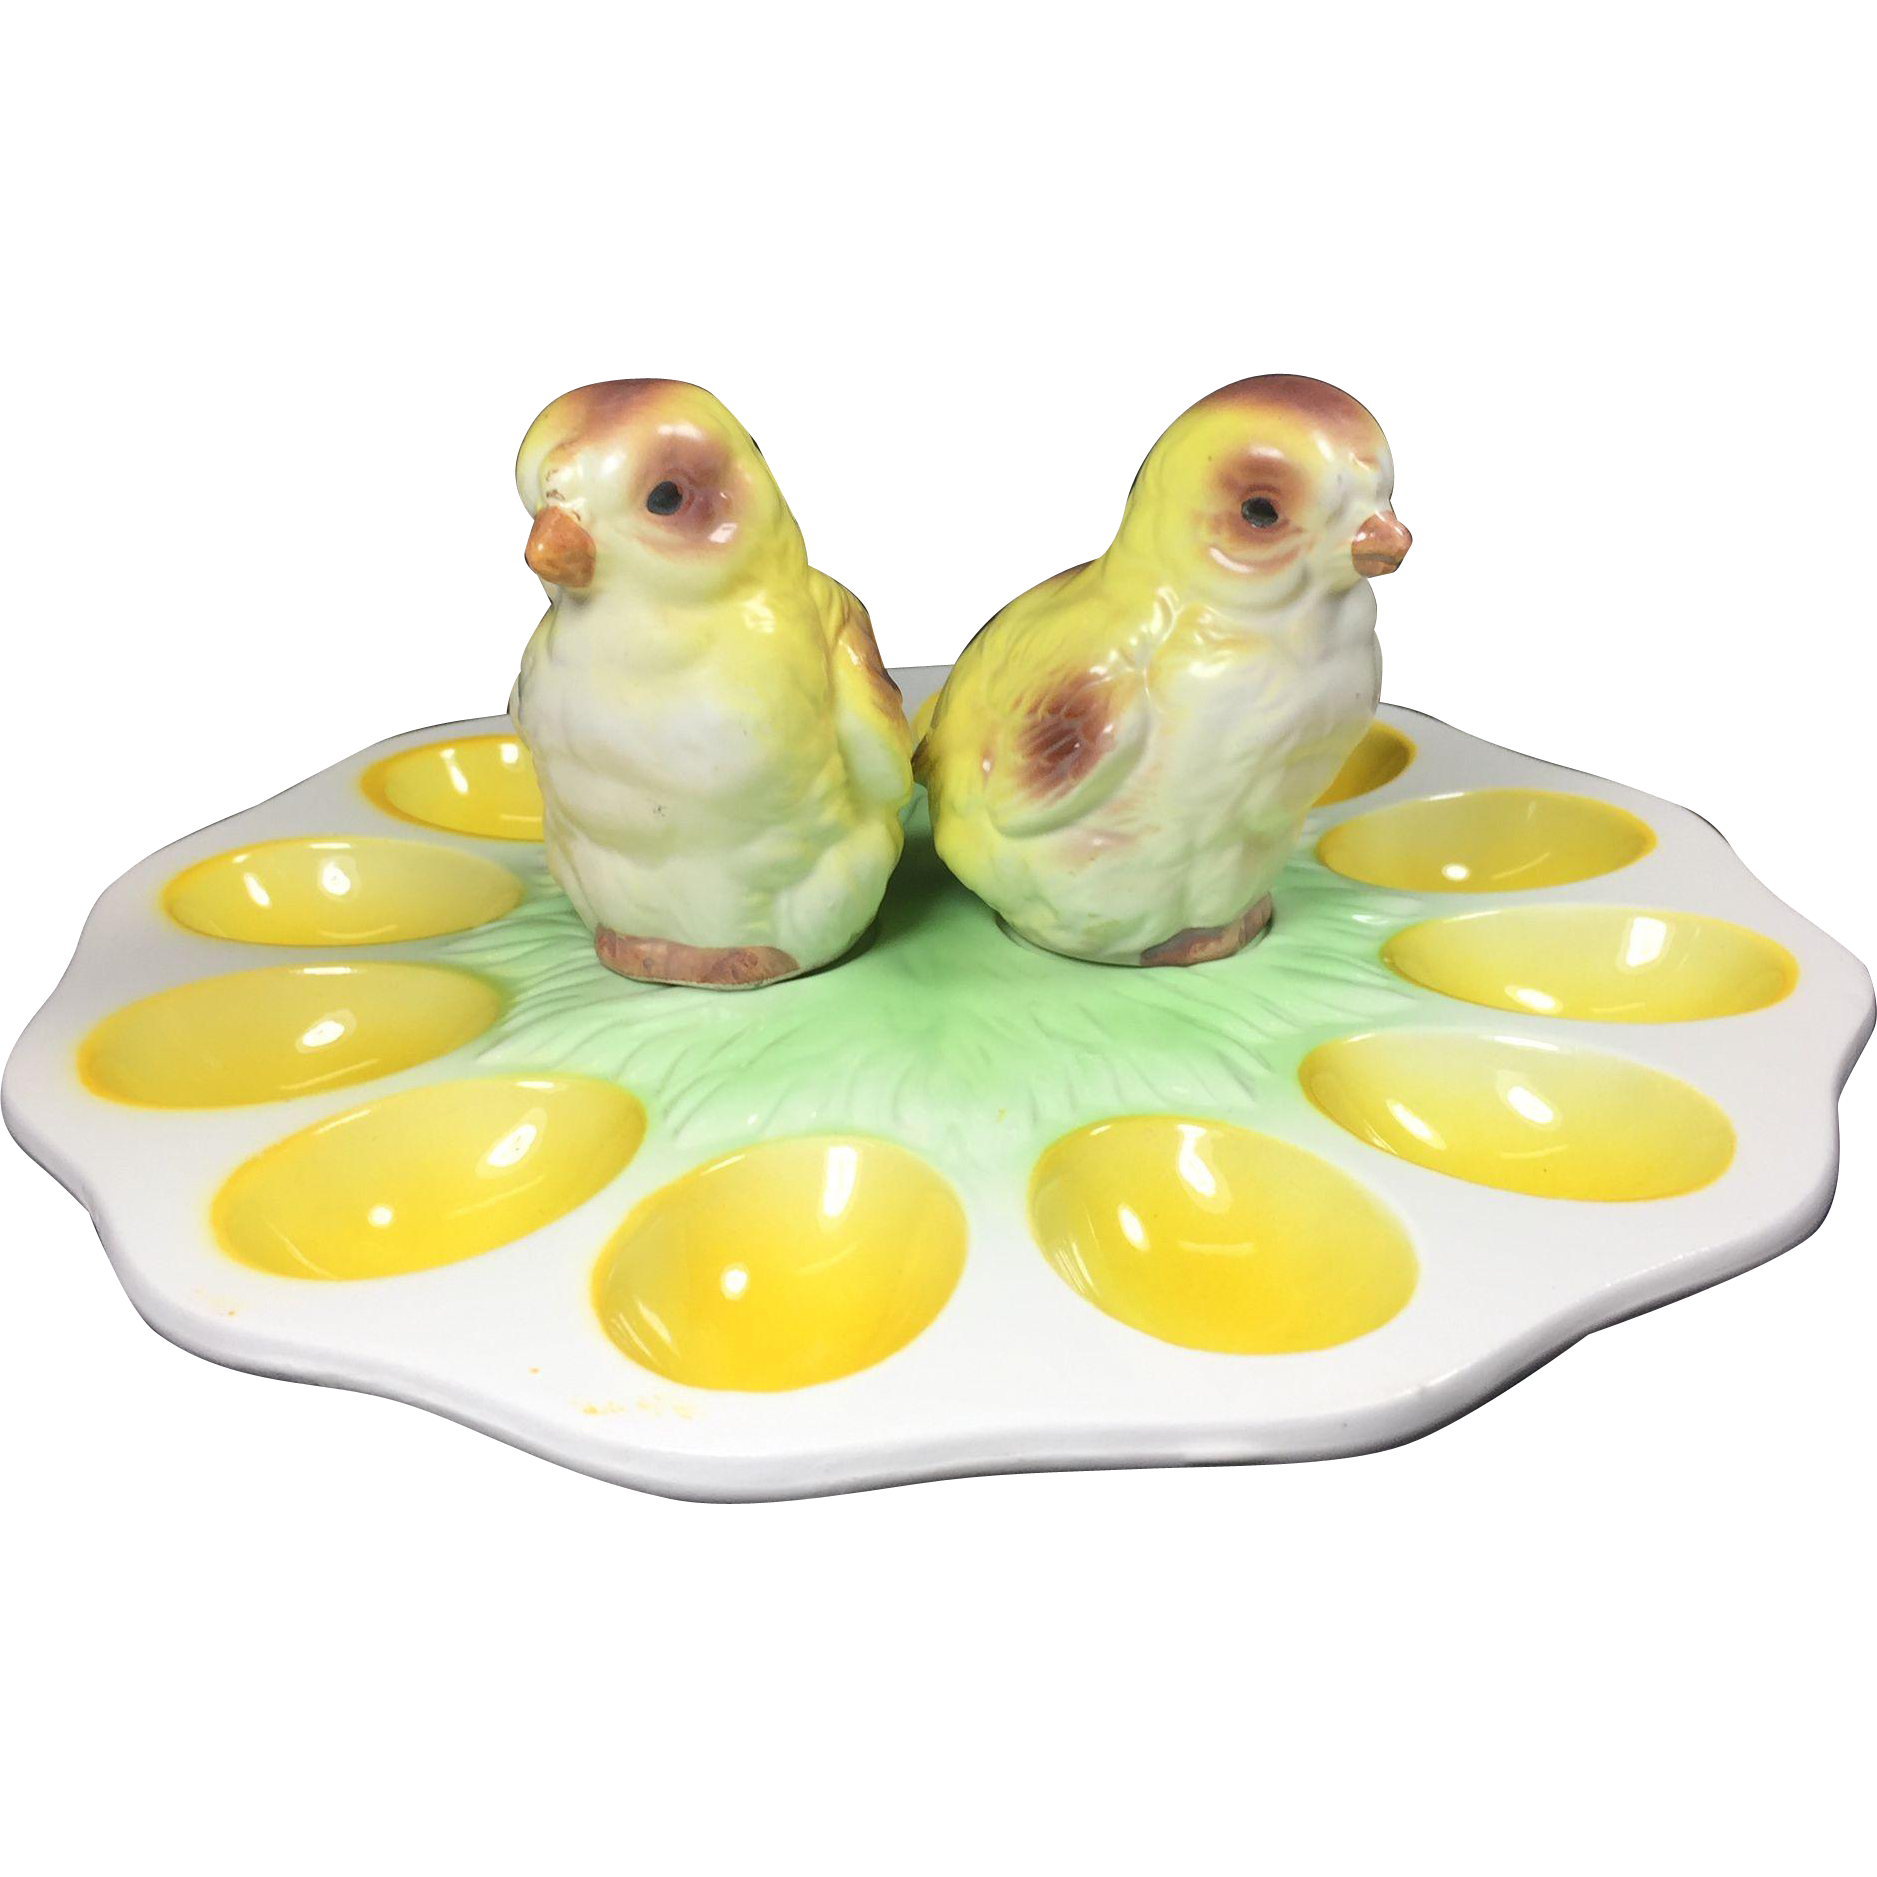 Vintage Chick Salt & Pepper Shakers on Egg Plate